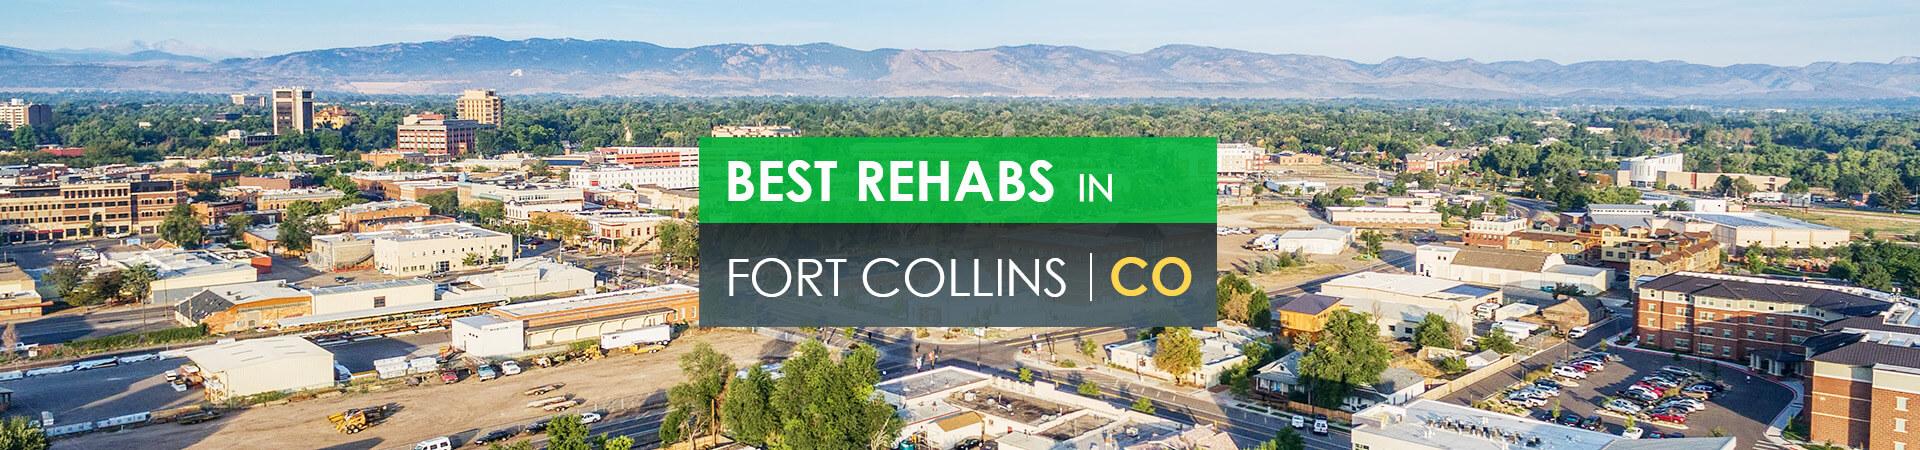 Best rehabs in Fort Collins, CO